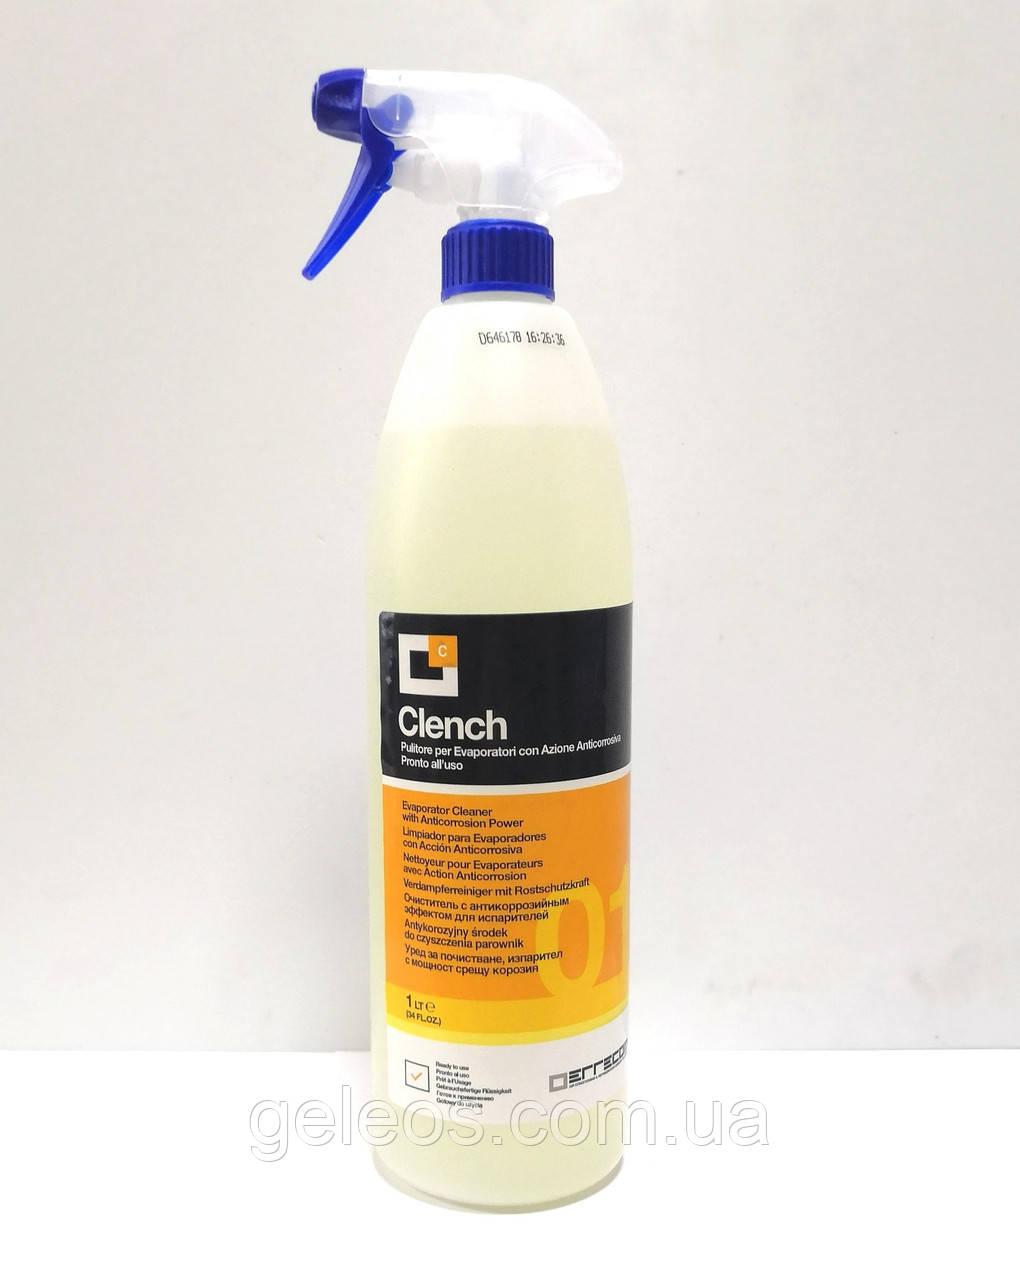 Clench средство для чистки кондиционеров (испарителей) 1L Errecom (Италия)